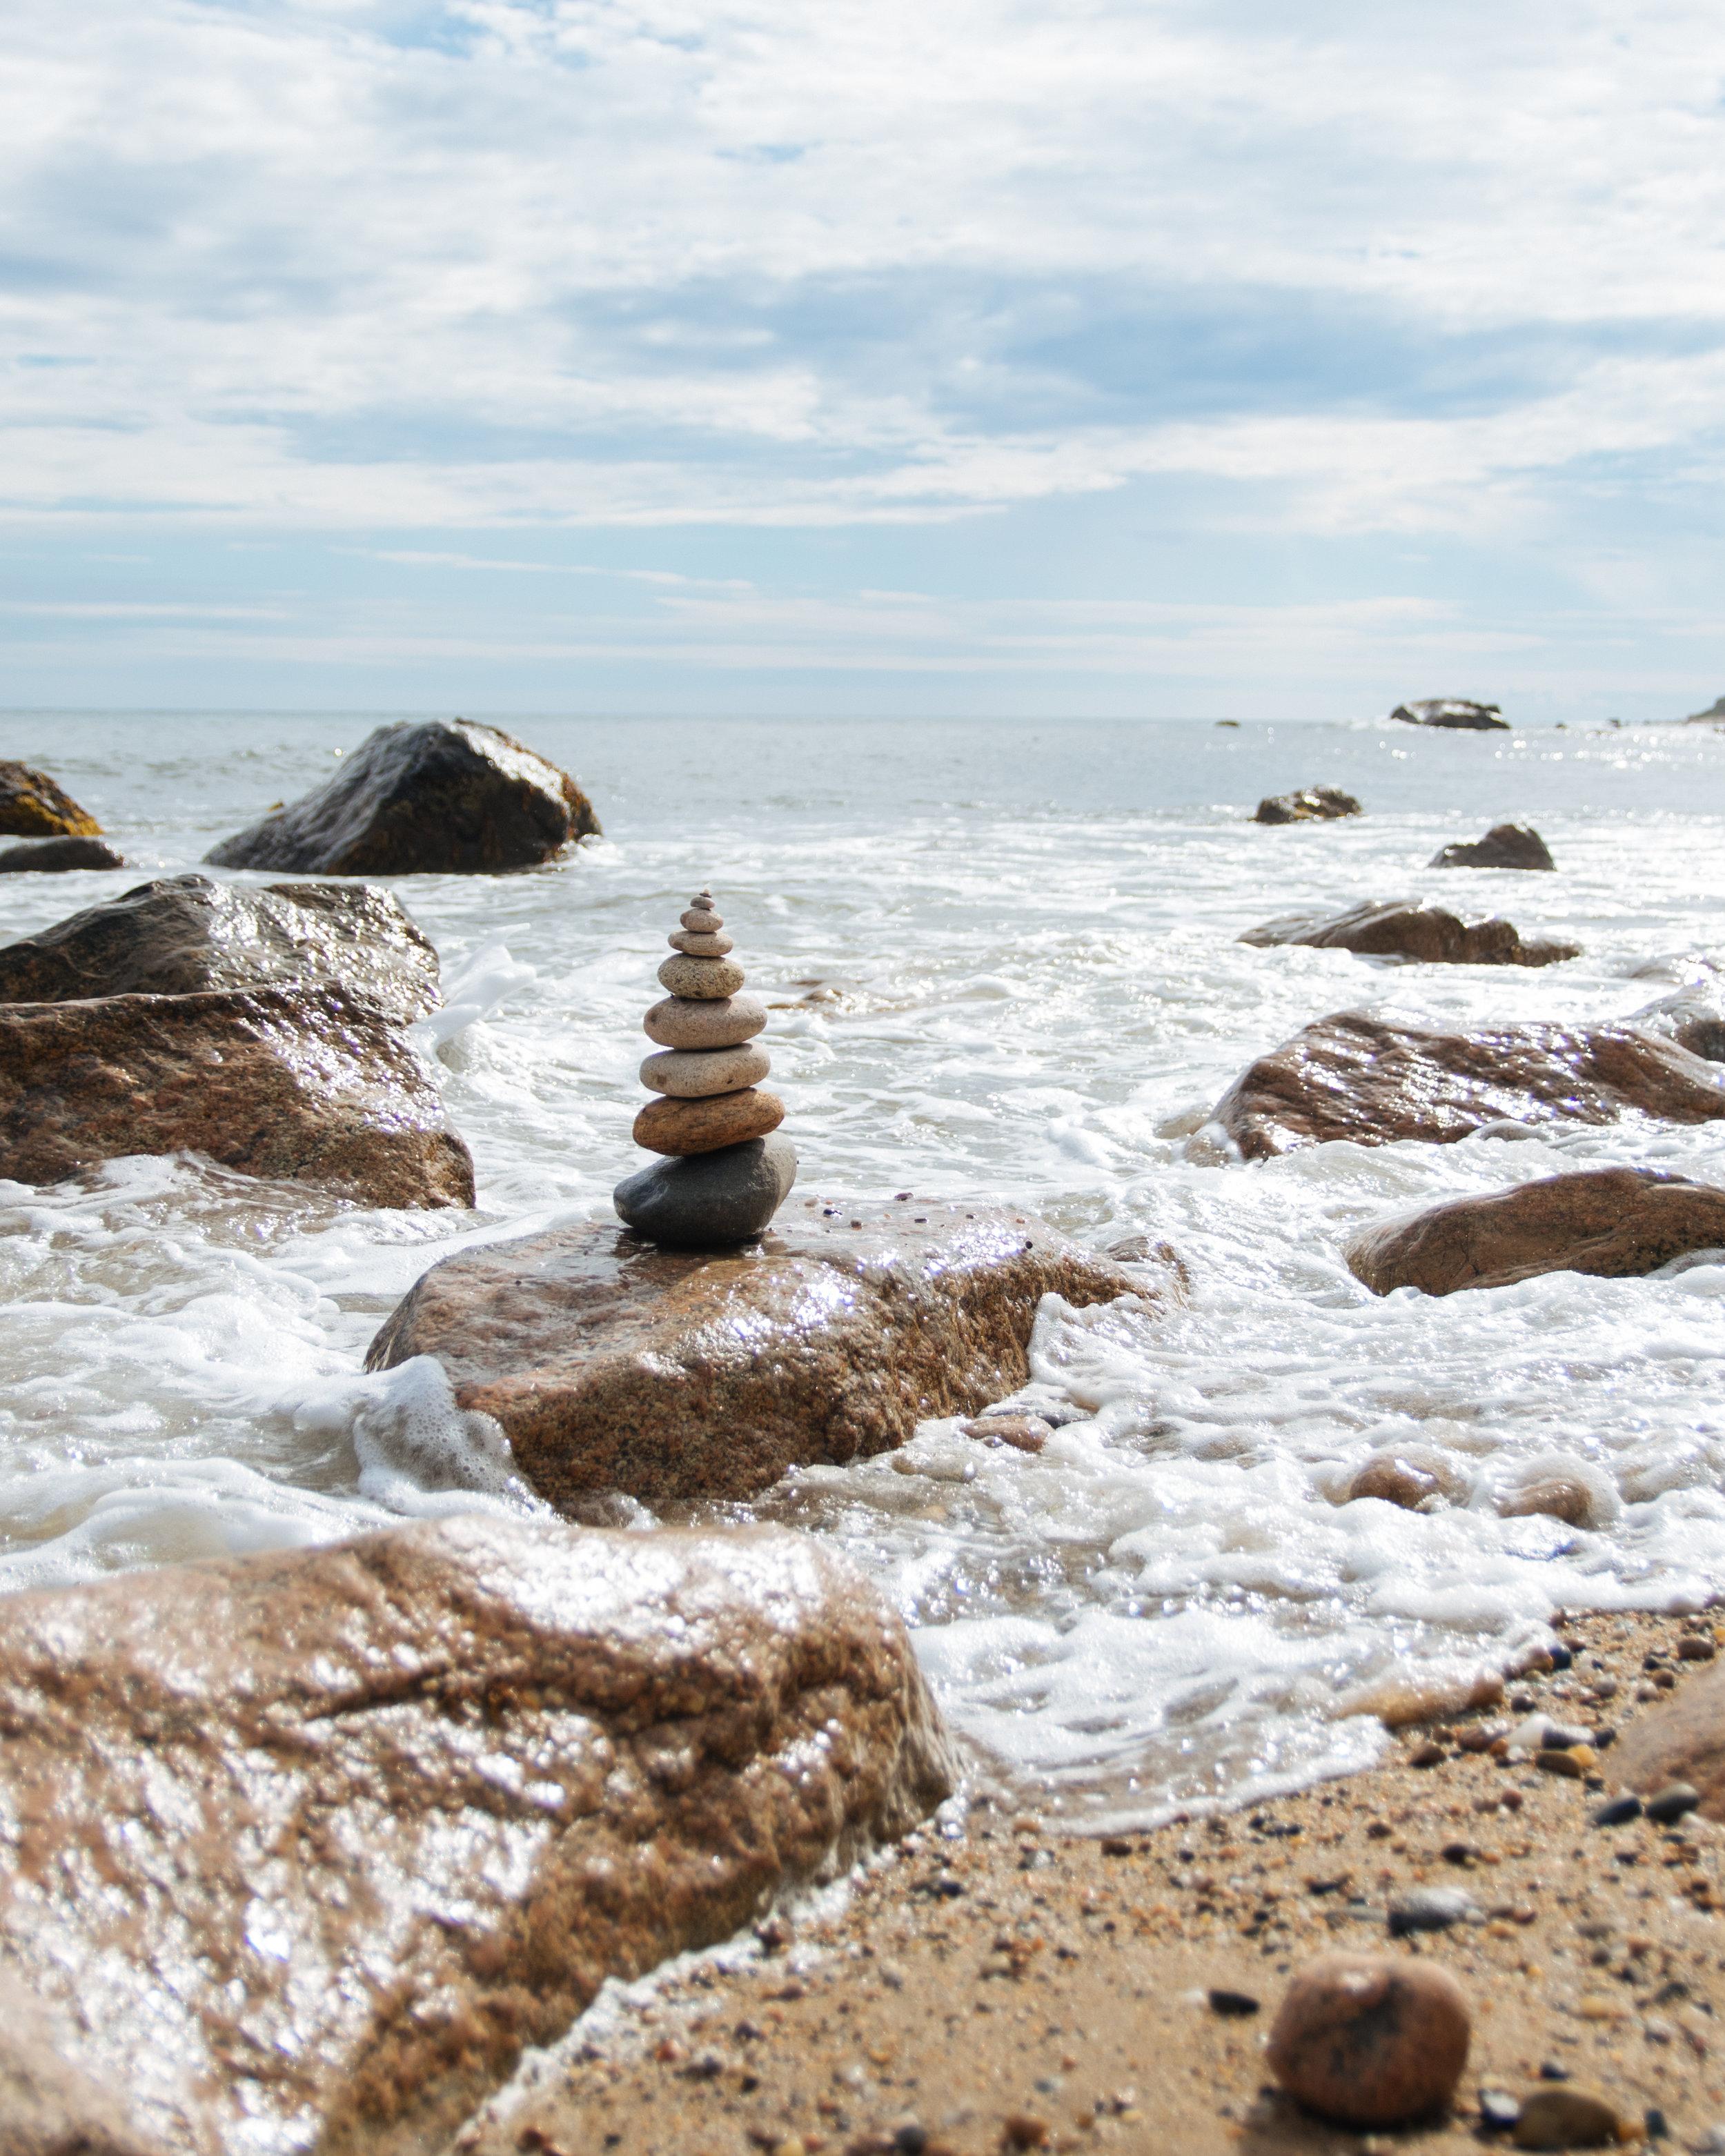 Seaside Totem